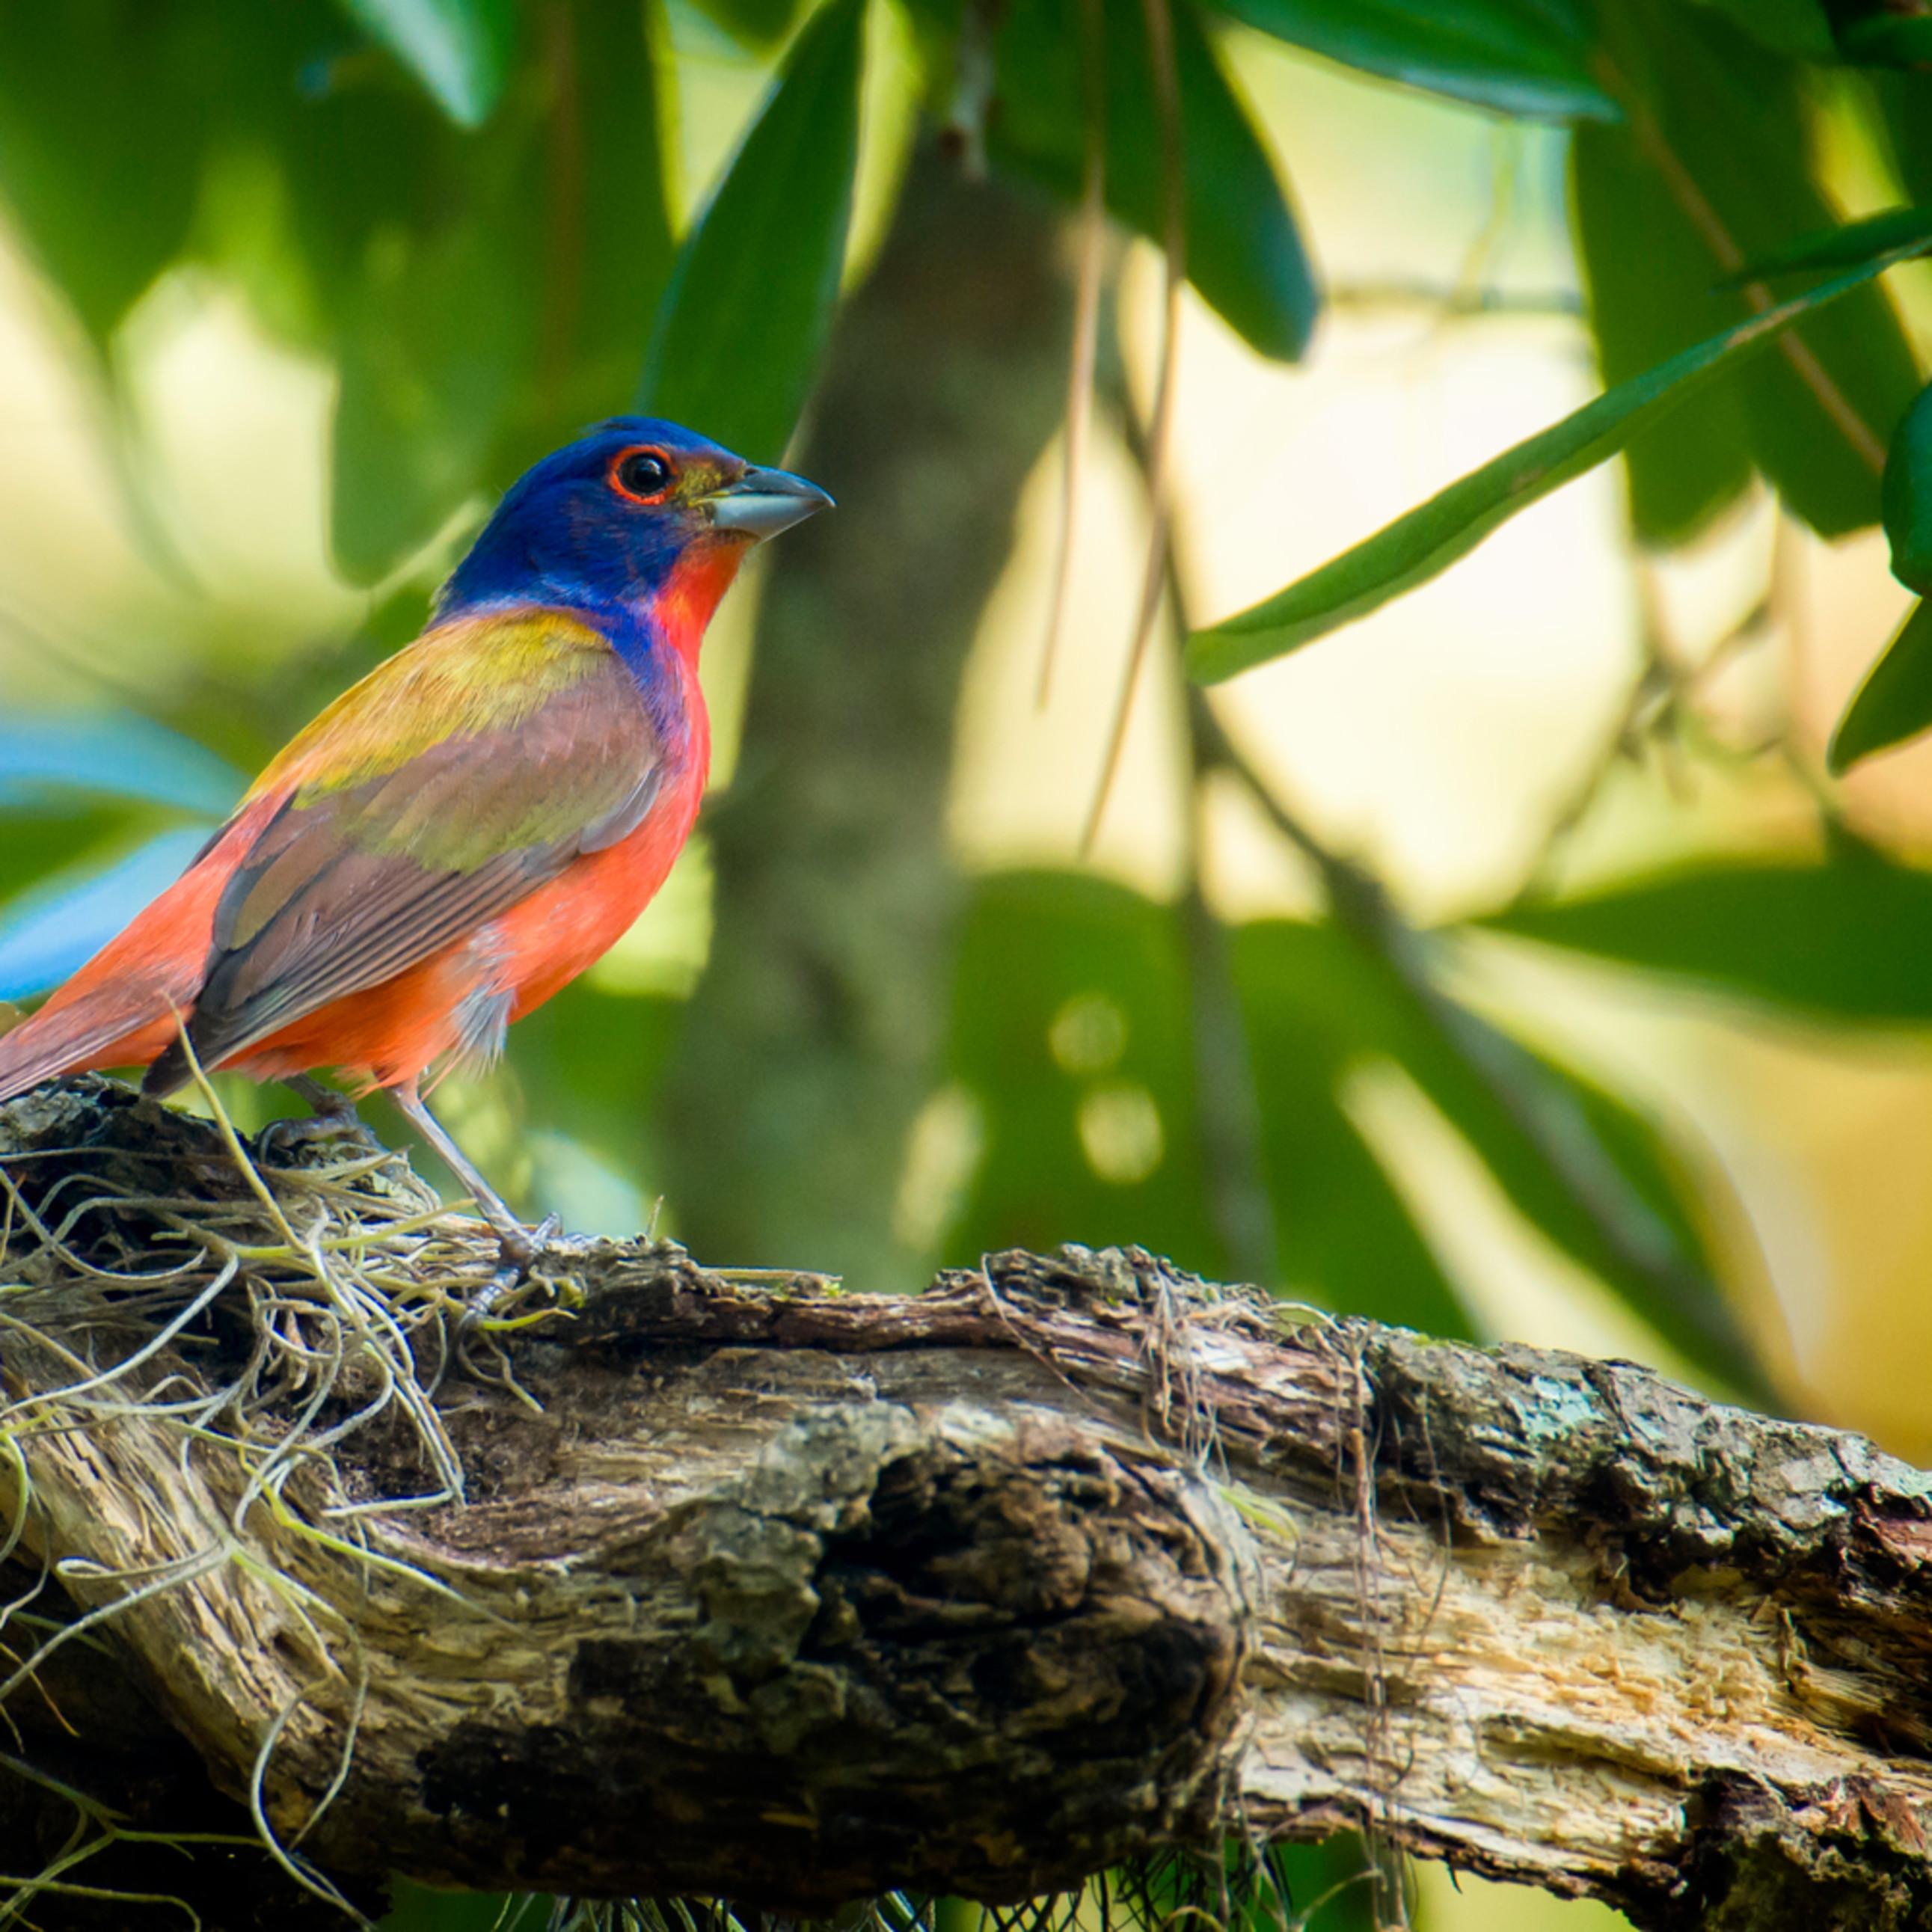 Backyard birds june 2020 20200611 0473 mhc11c